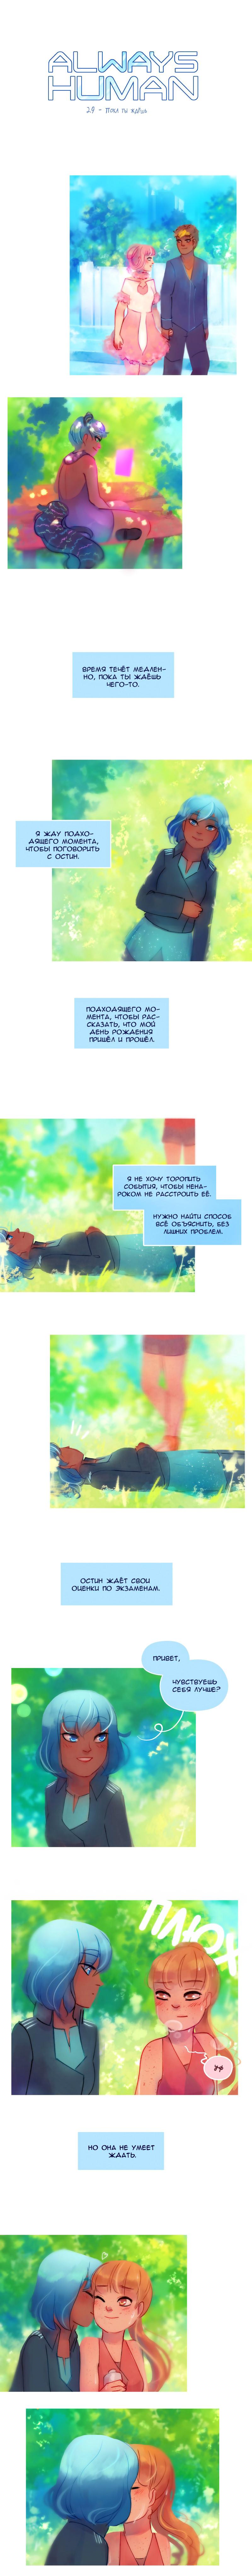 https://r1.ninemanga.com/comics/pic2/31/32415/388995/1513587926994.jpg Page 1